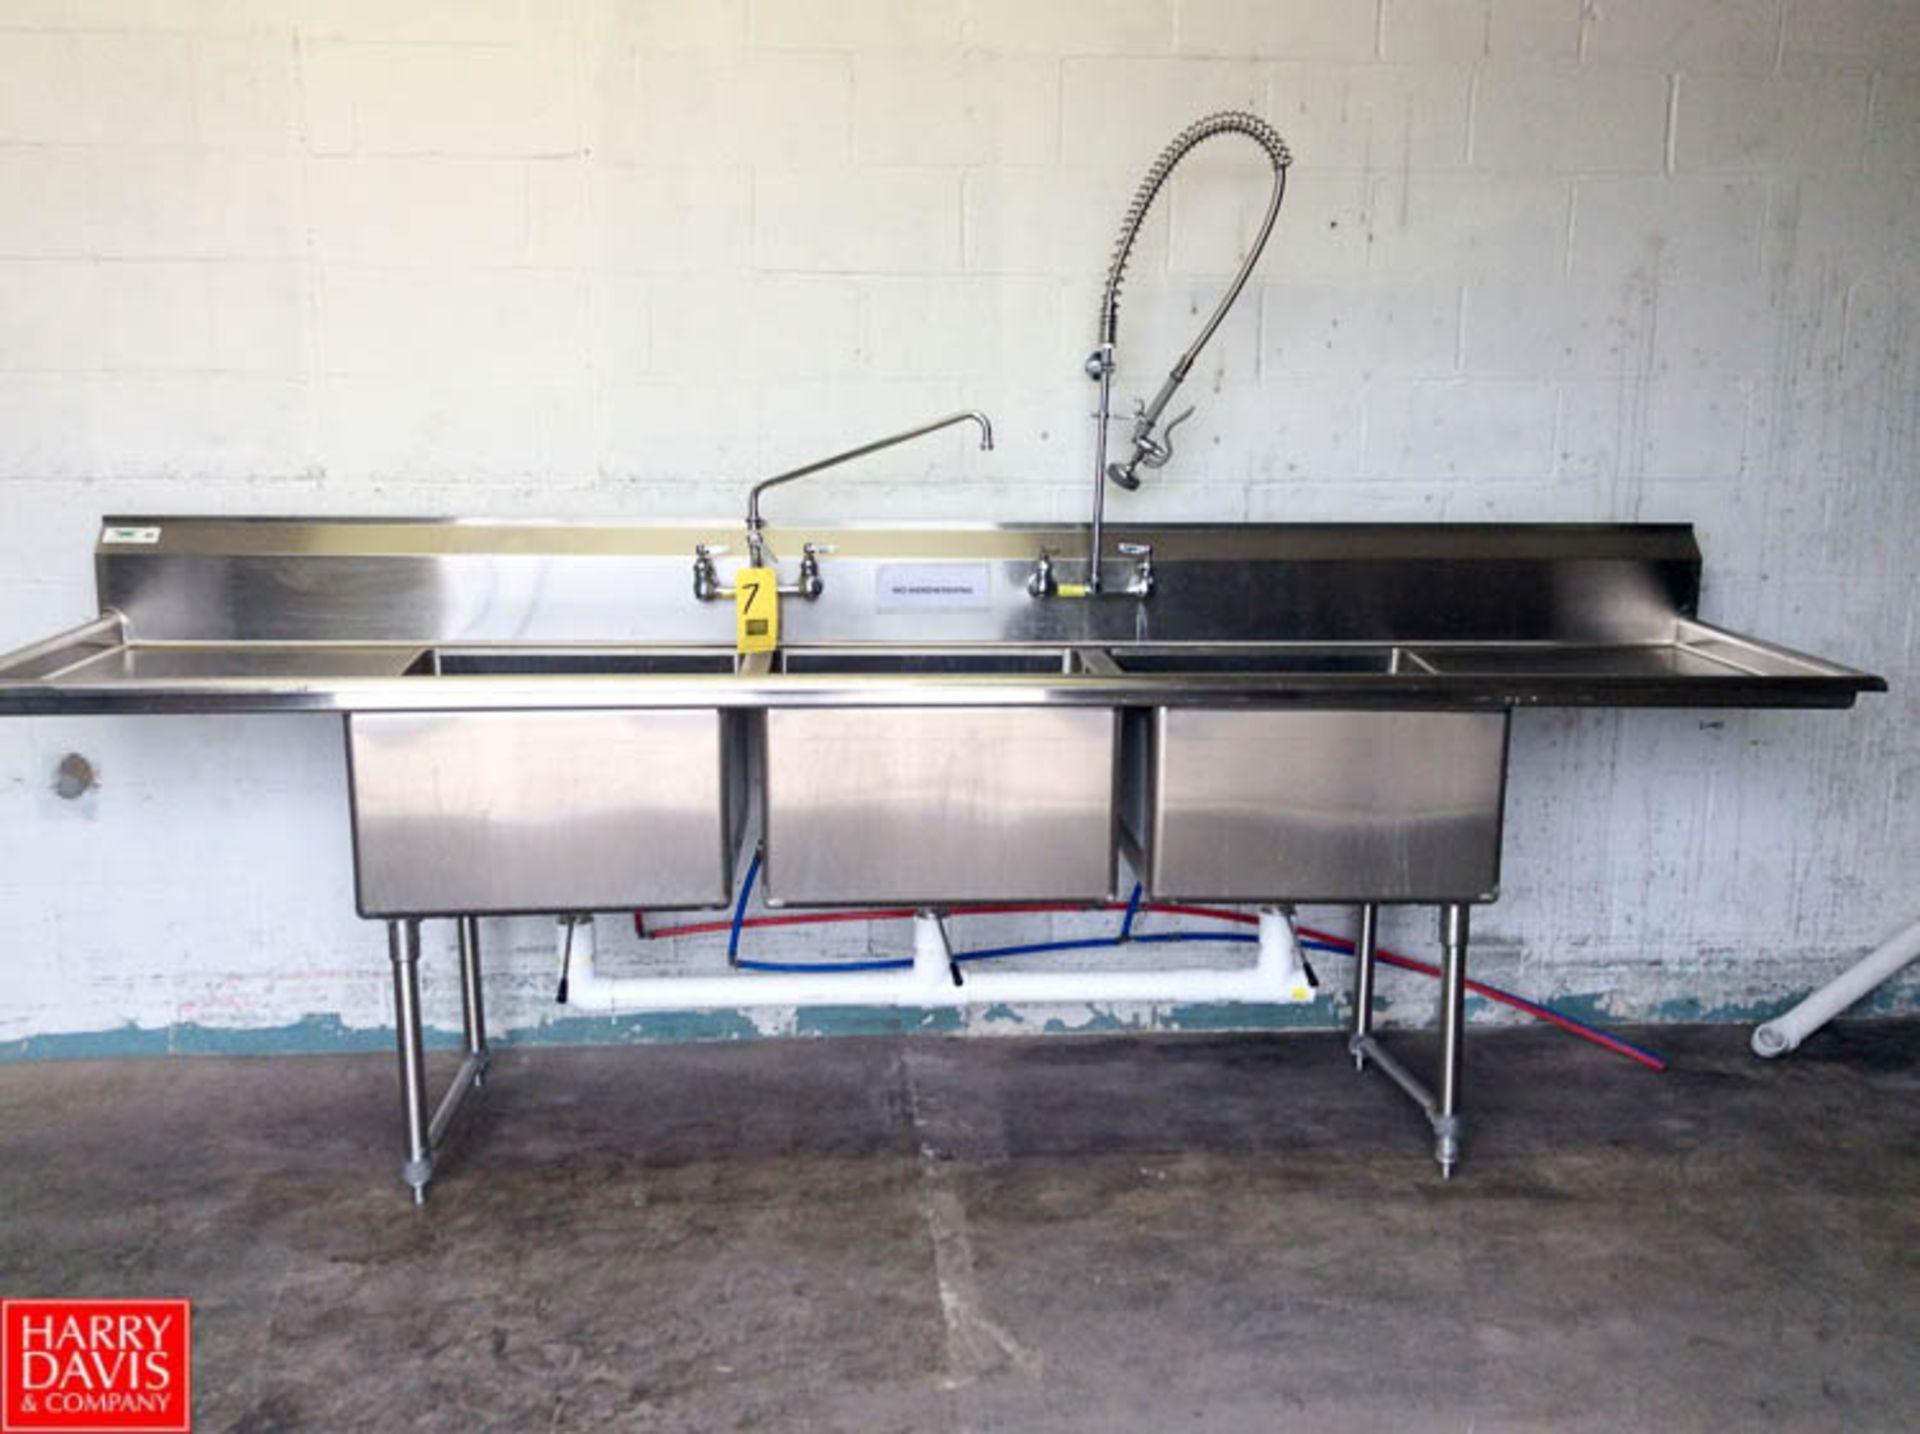 Lot 7 - Regency S/S Triple Bowl Sink with Back Splash, Rounded Edges, Valves and Spray Head, Model